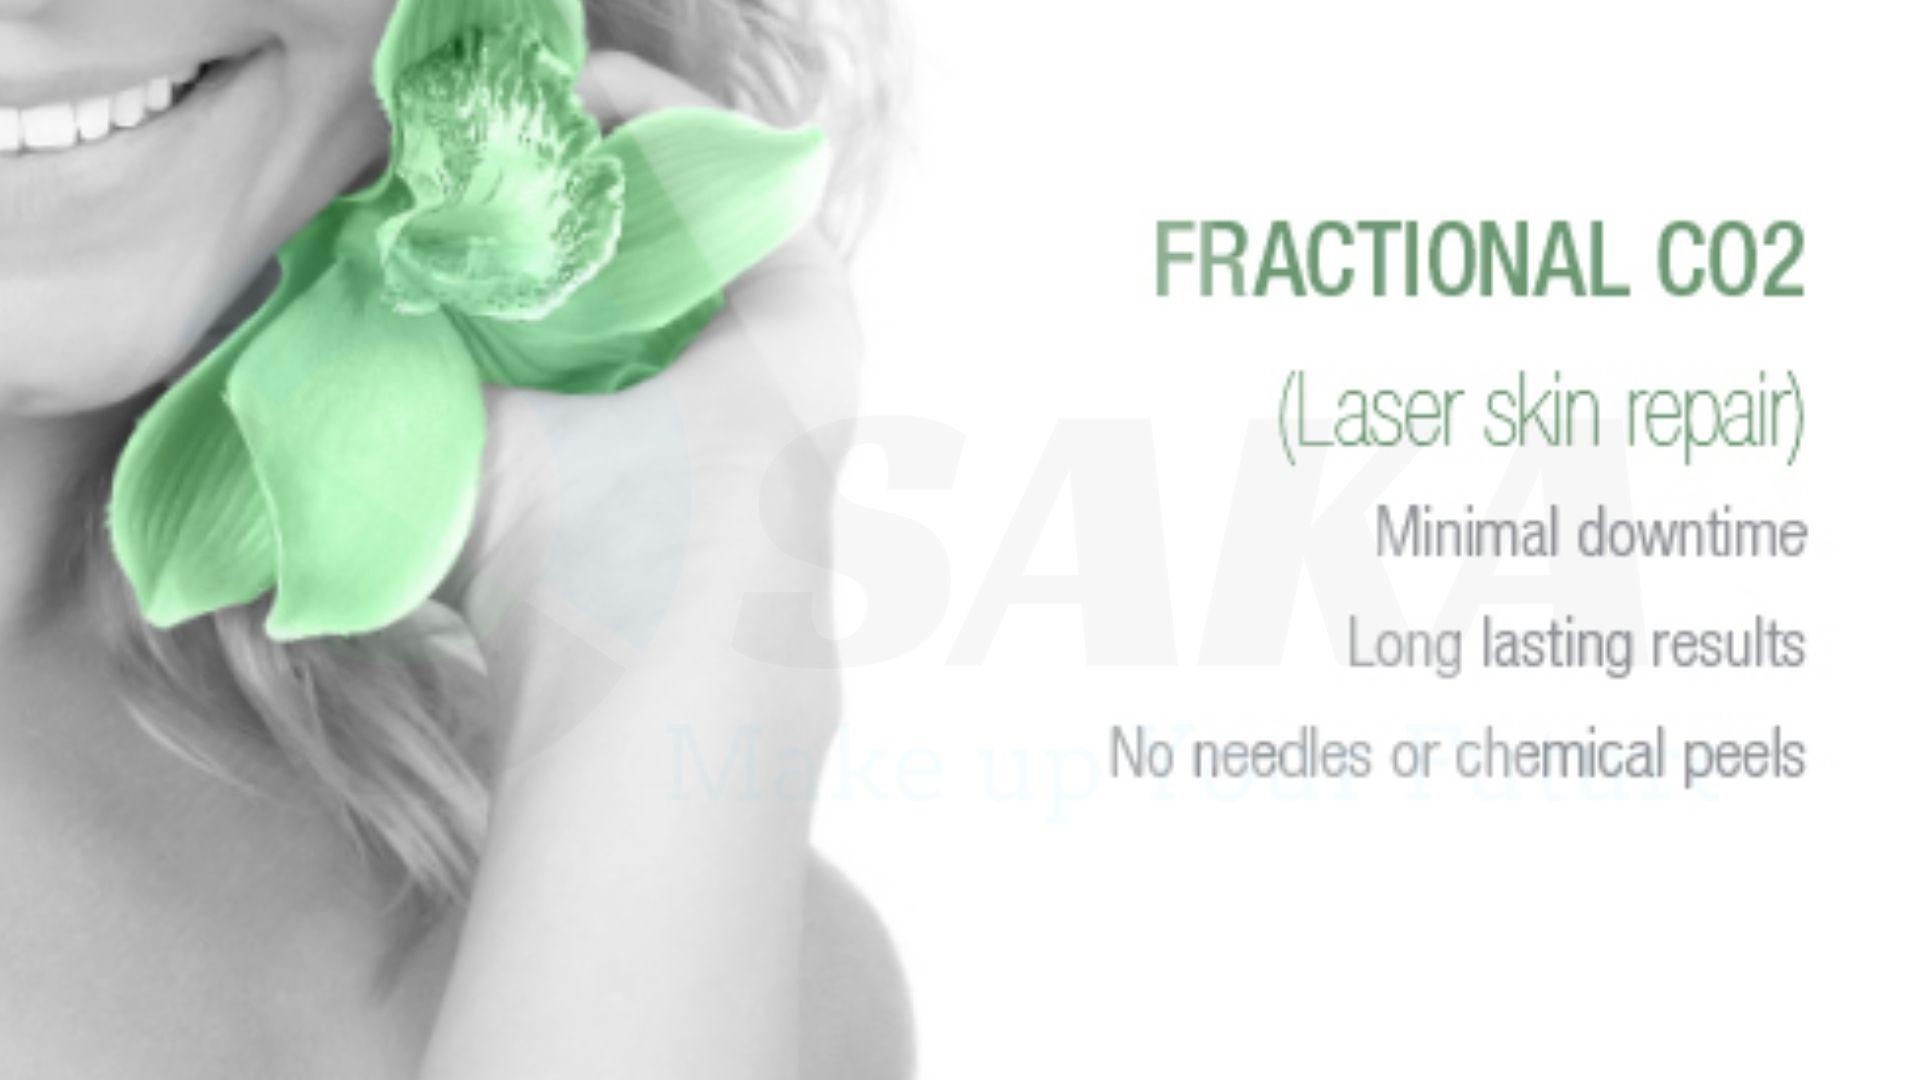 Nhu cầu điều trị Laser CO2 Fractional